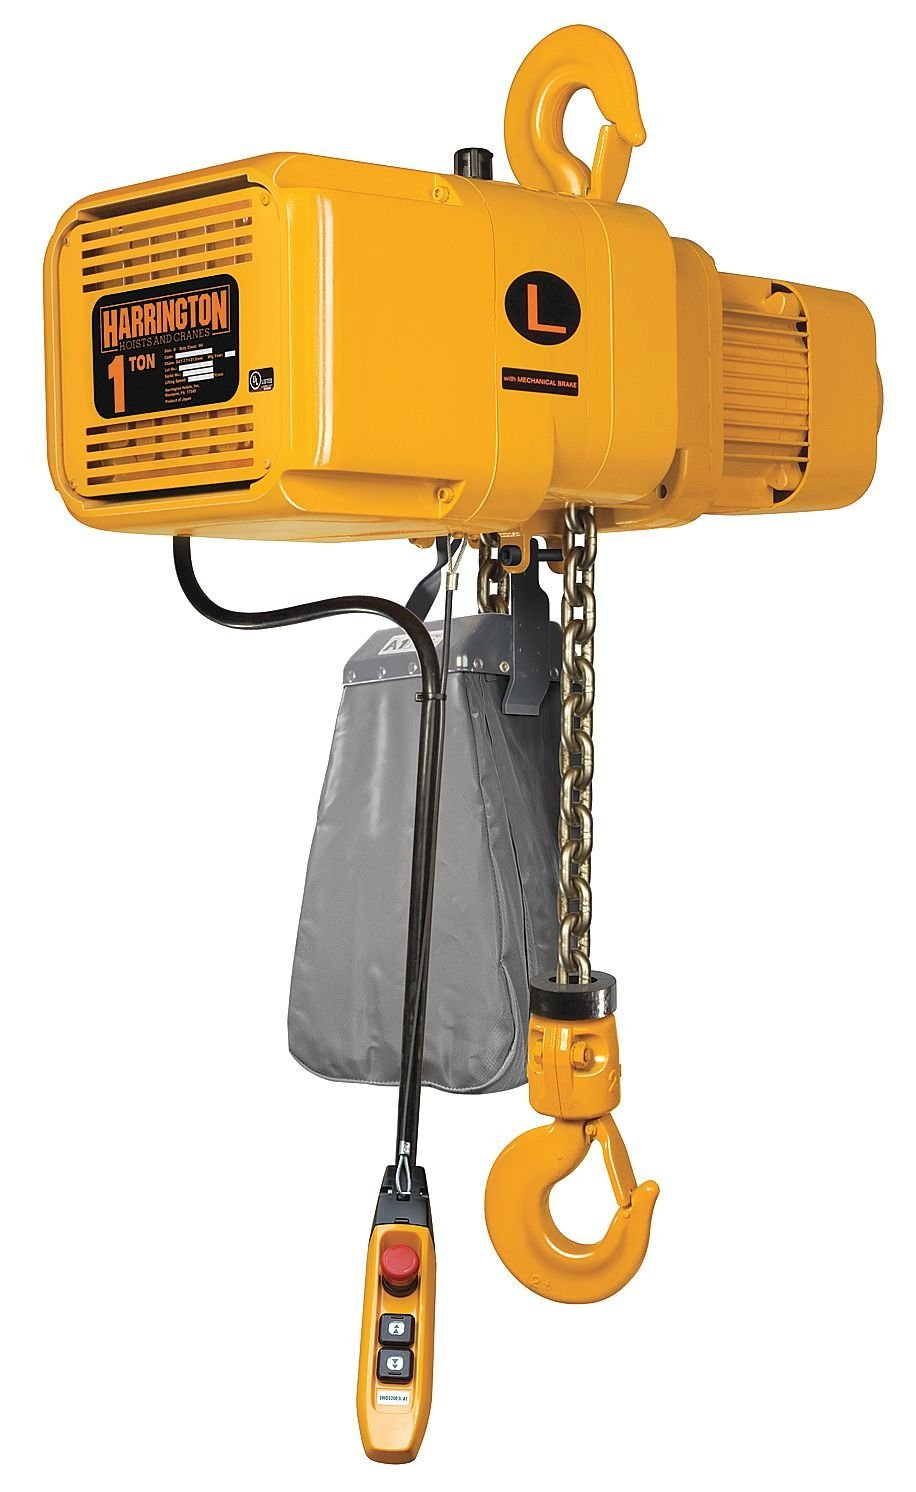 Harrington NERP003SD-15 NER Electric Hoist w/Push Trolley- 1/4 Ton, 15' Lift, 36/6 ft/min, 230V